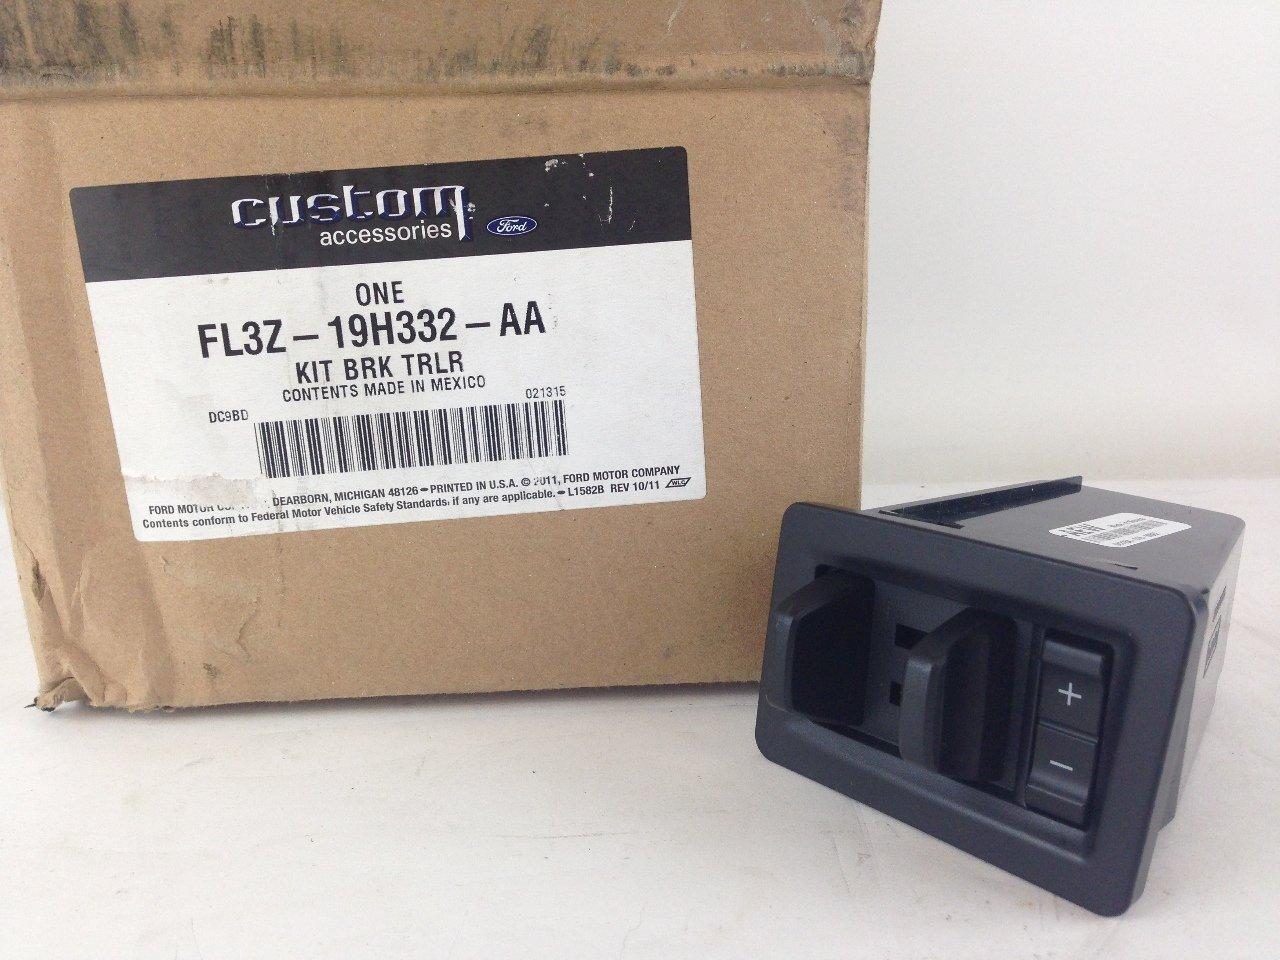 Ford FL3Z-19H332-AA Part # Dash Trailer Brake Control Module Kit by Ford